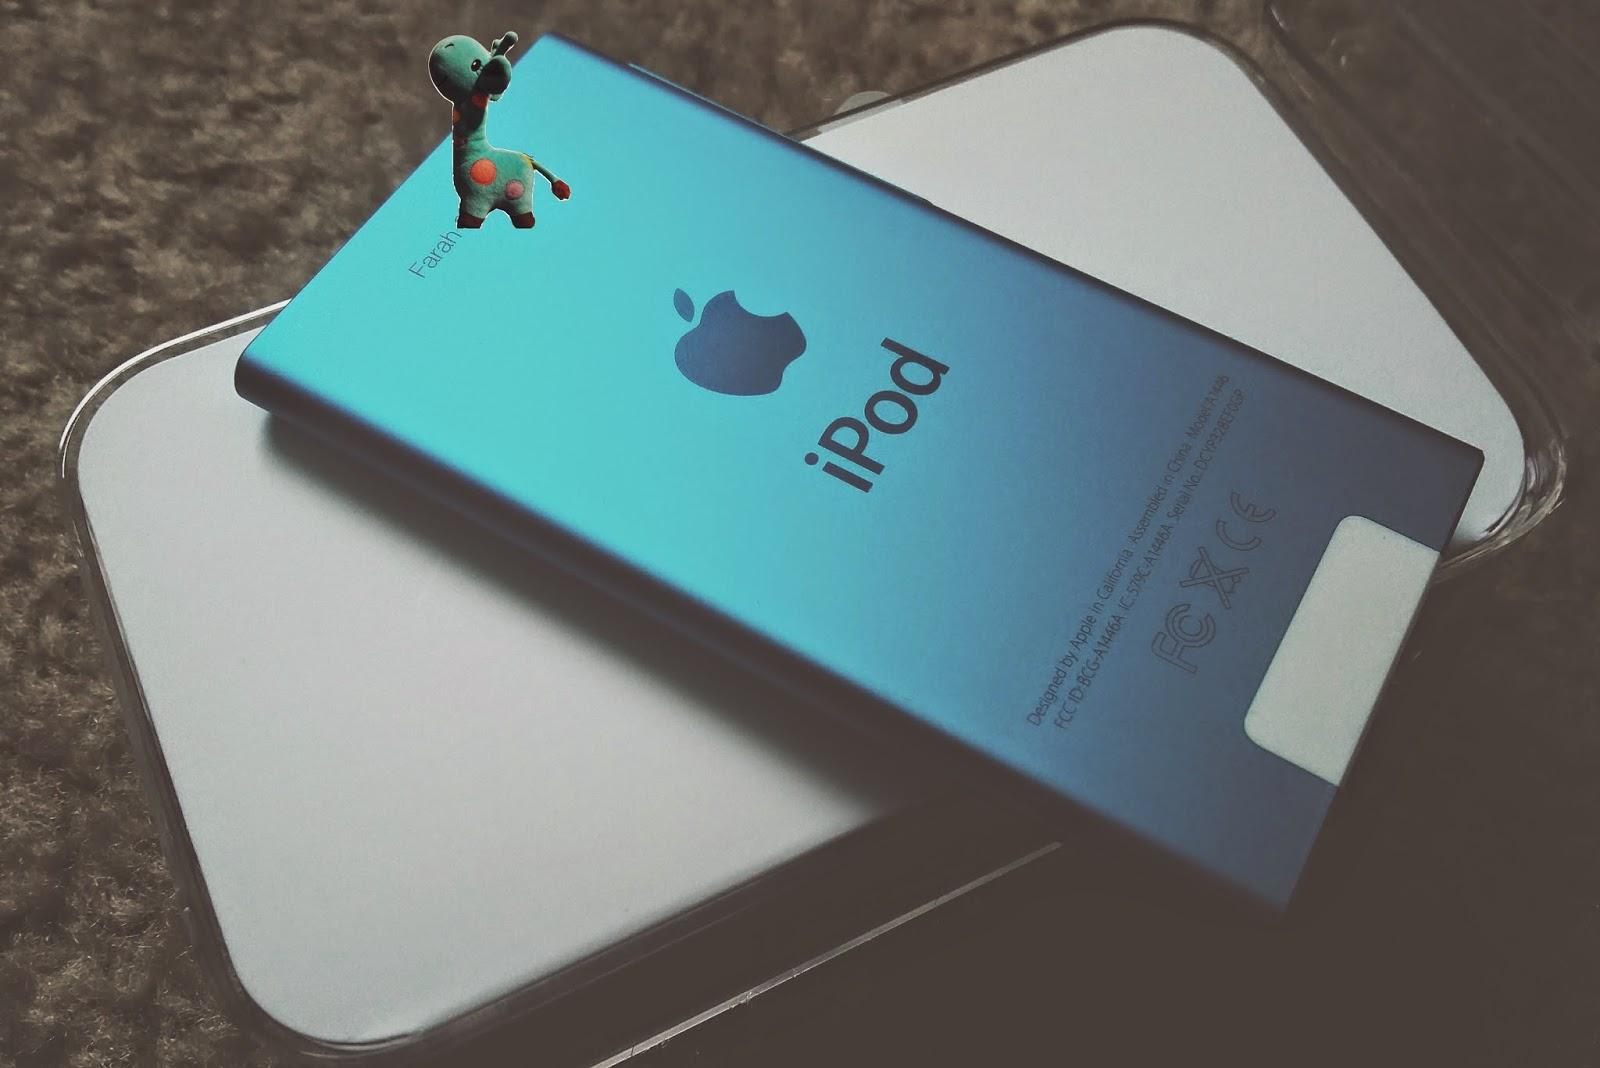 Personalized iPod nano blue